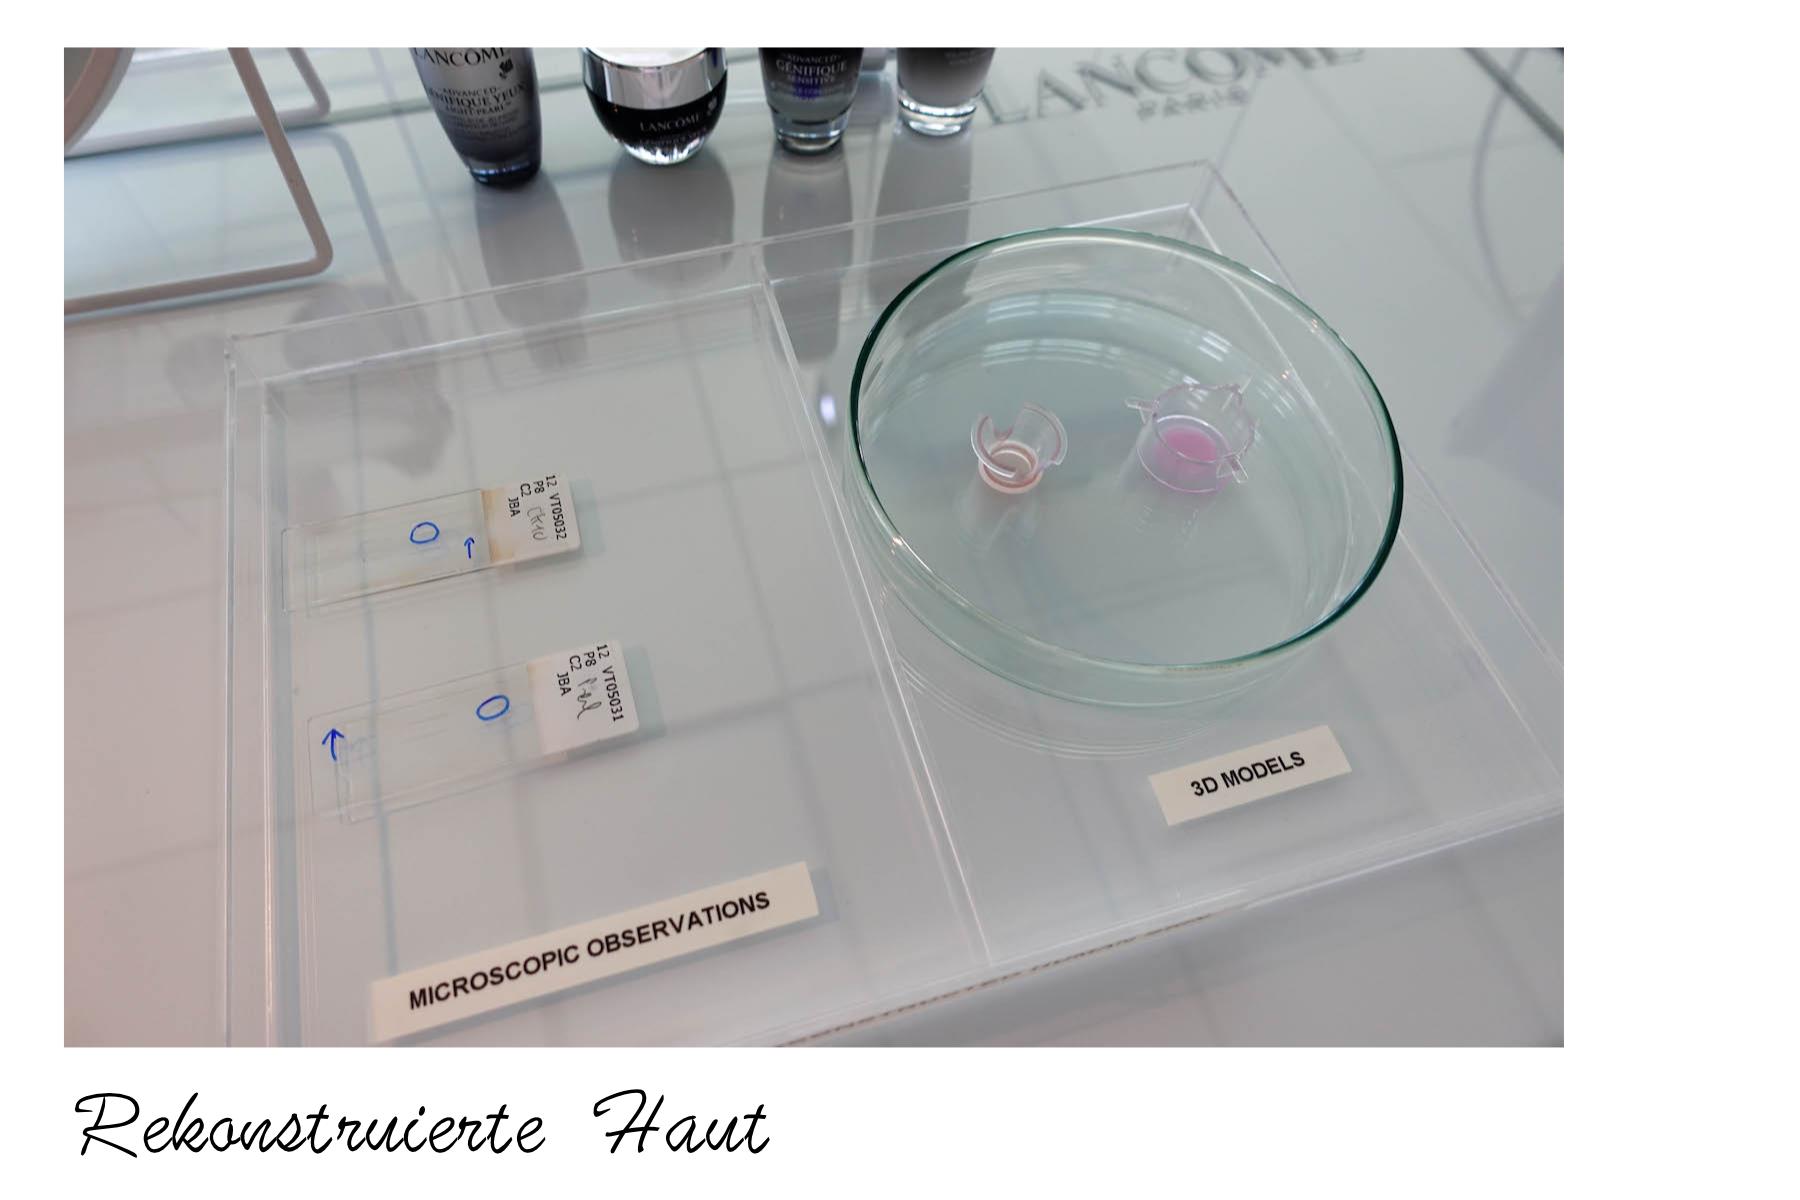 suelovesnyc_lancome_labor_rekonstruierte_haut Lancôme skincare lab